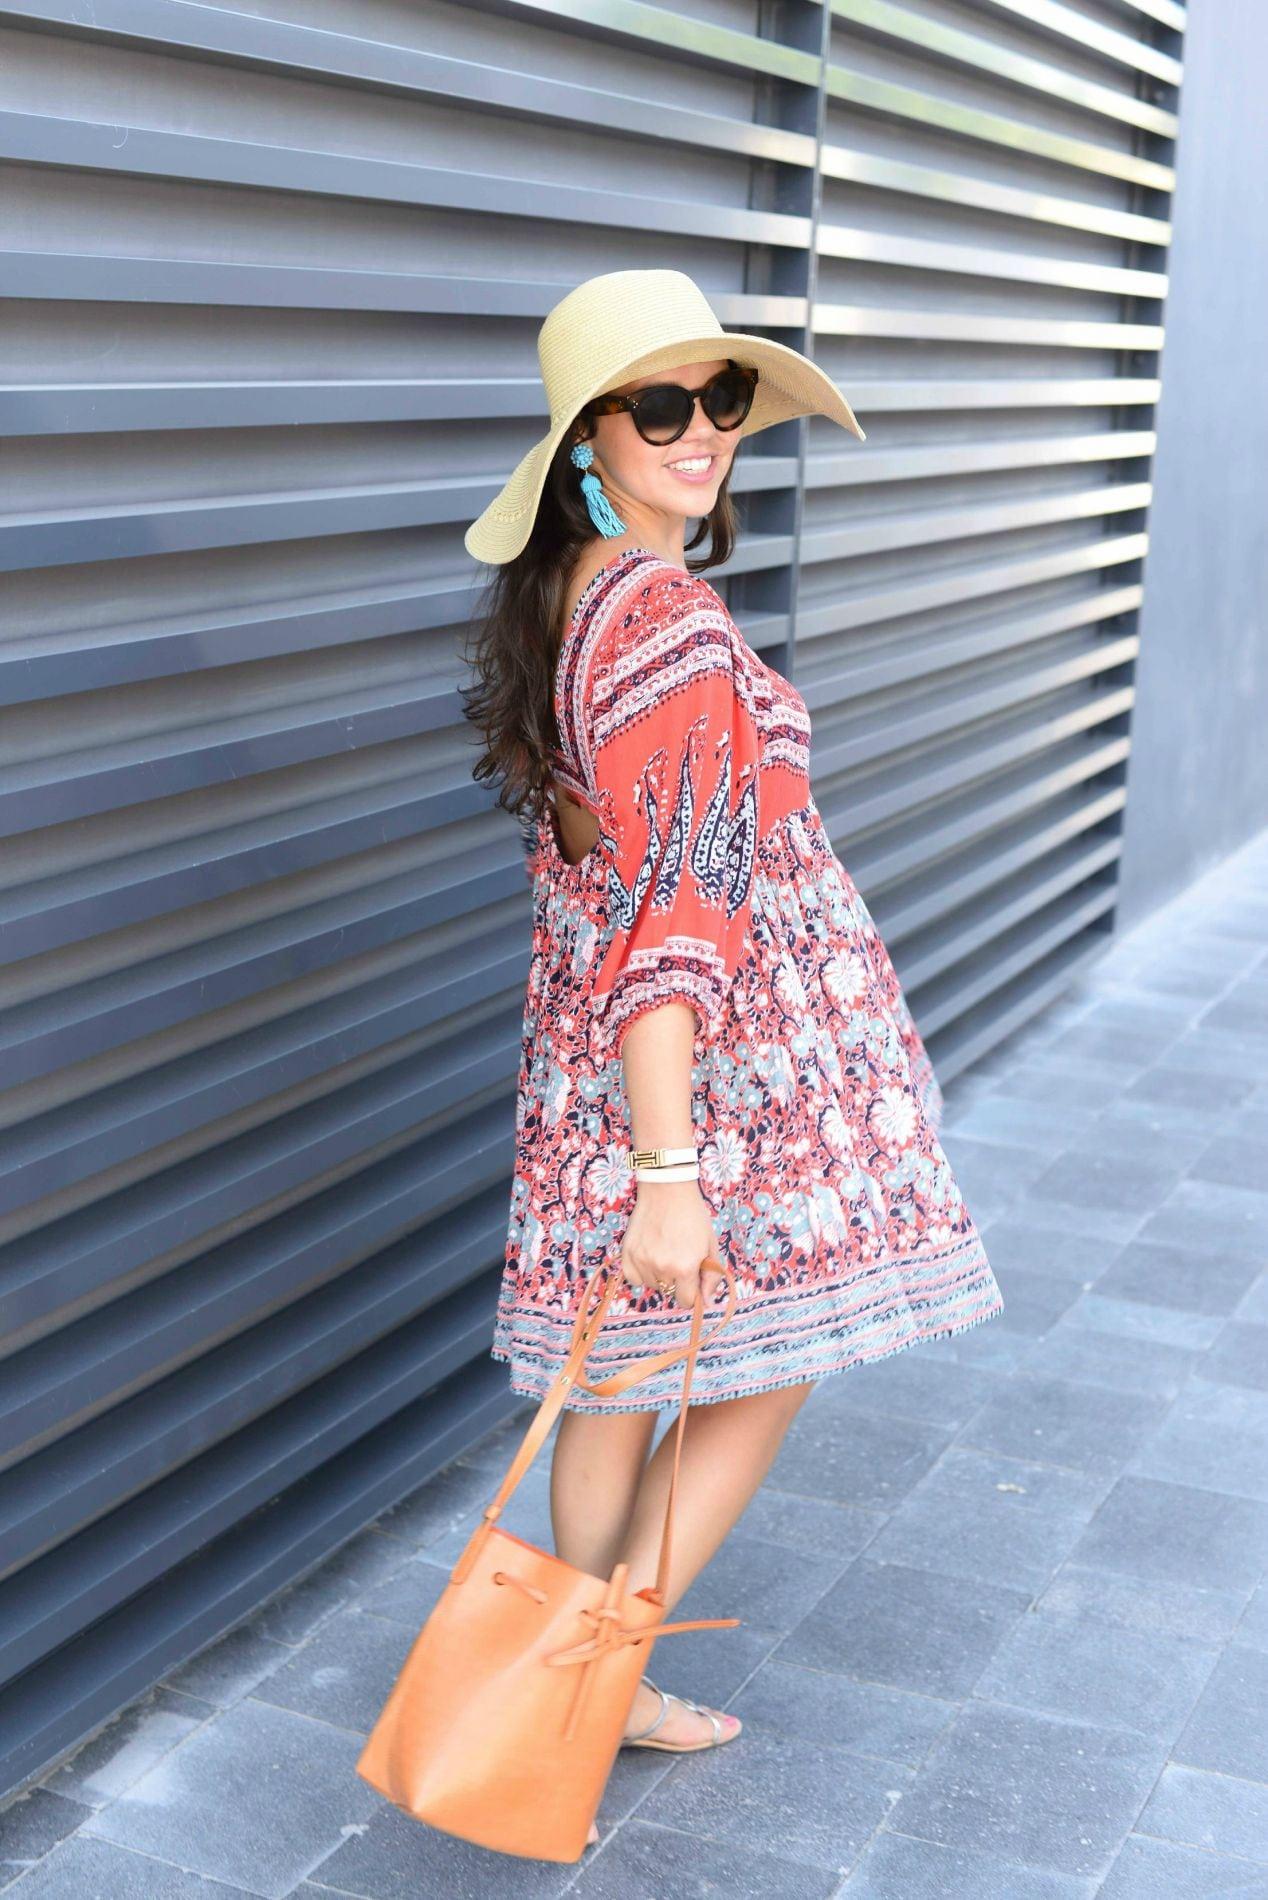 Dressing for Dubai Summer heat